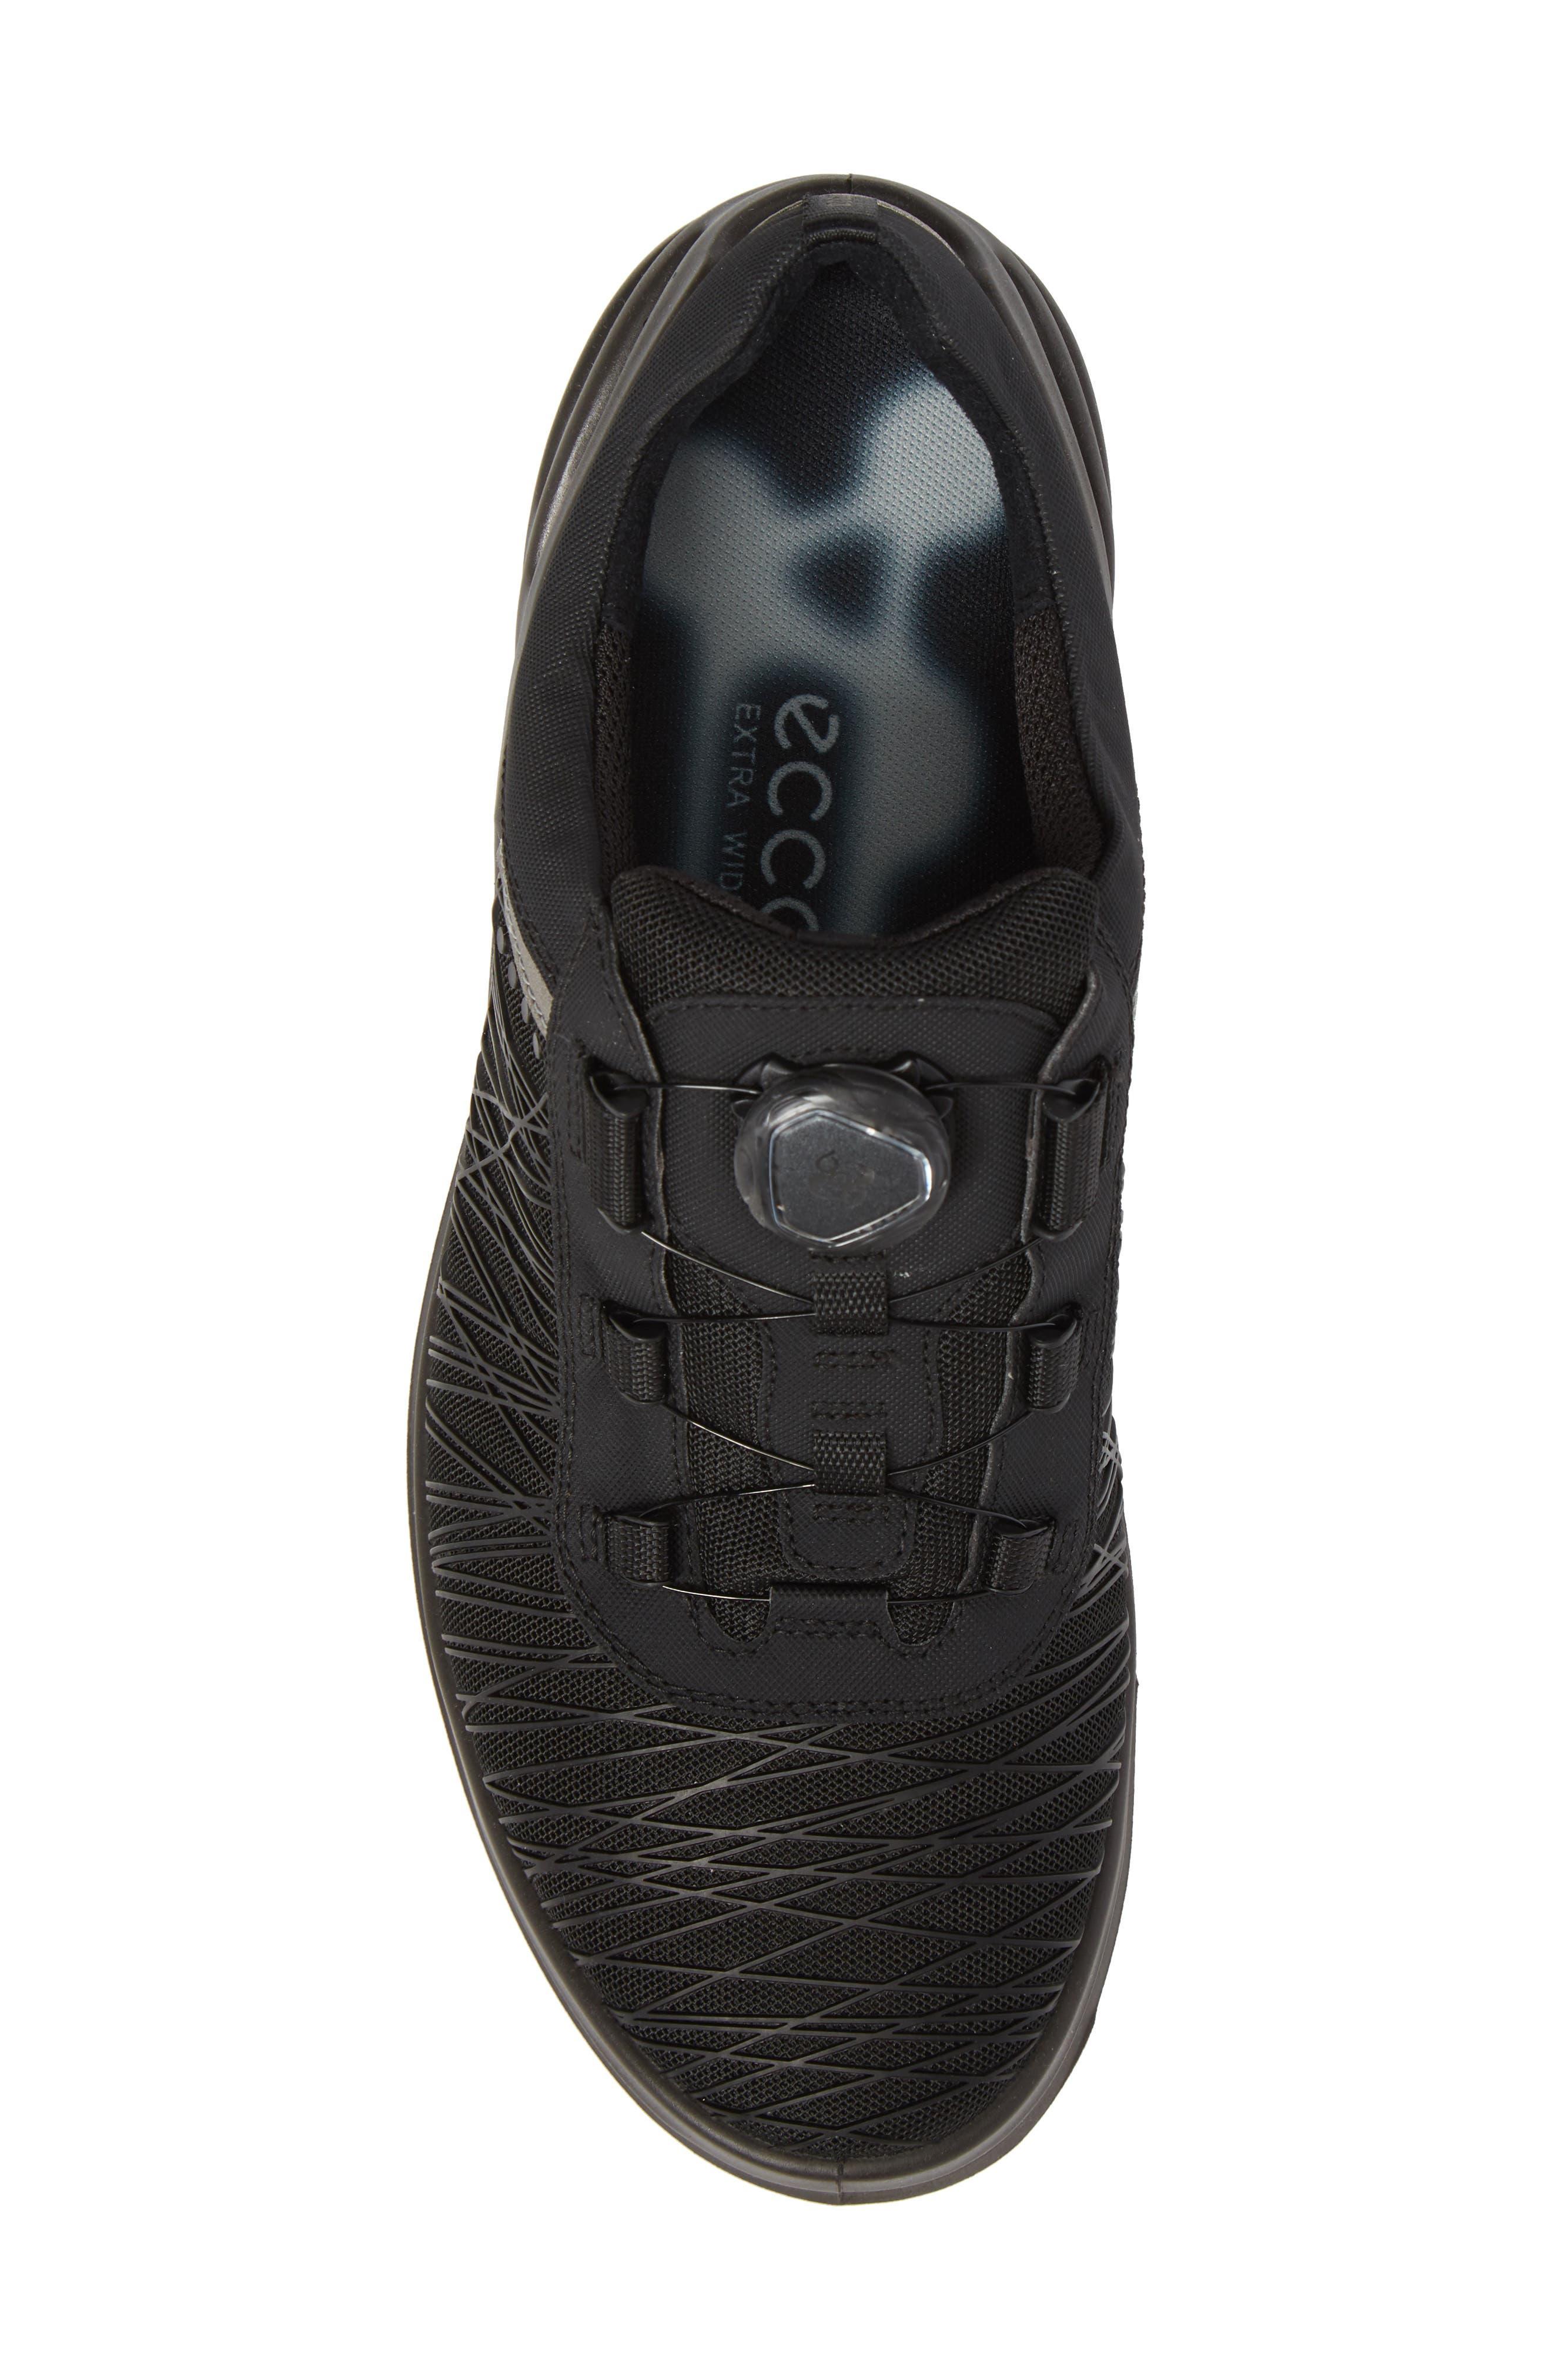 Cage Pro BOA Golf Shoe,                             Alternate thumbnail 5, color,                             Black